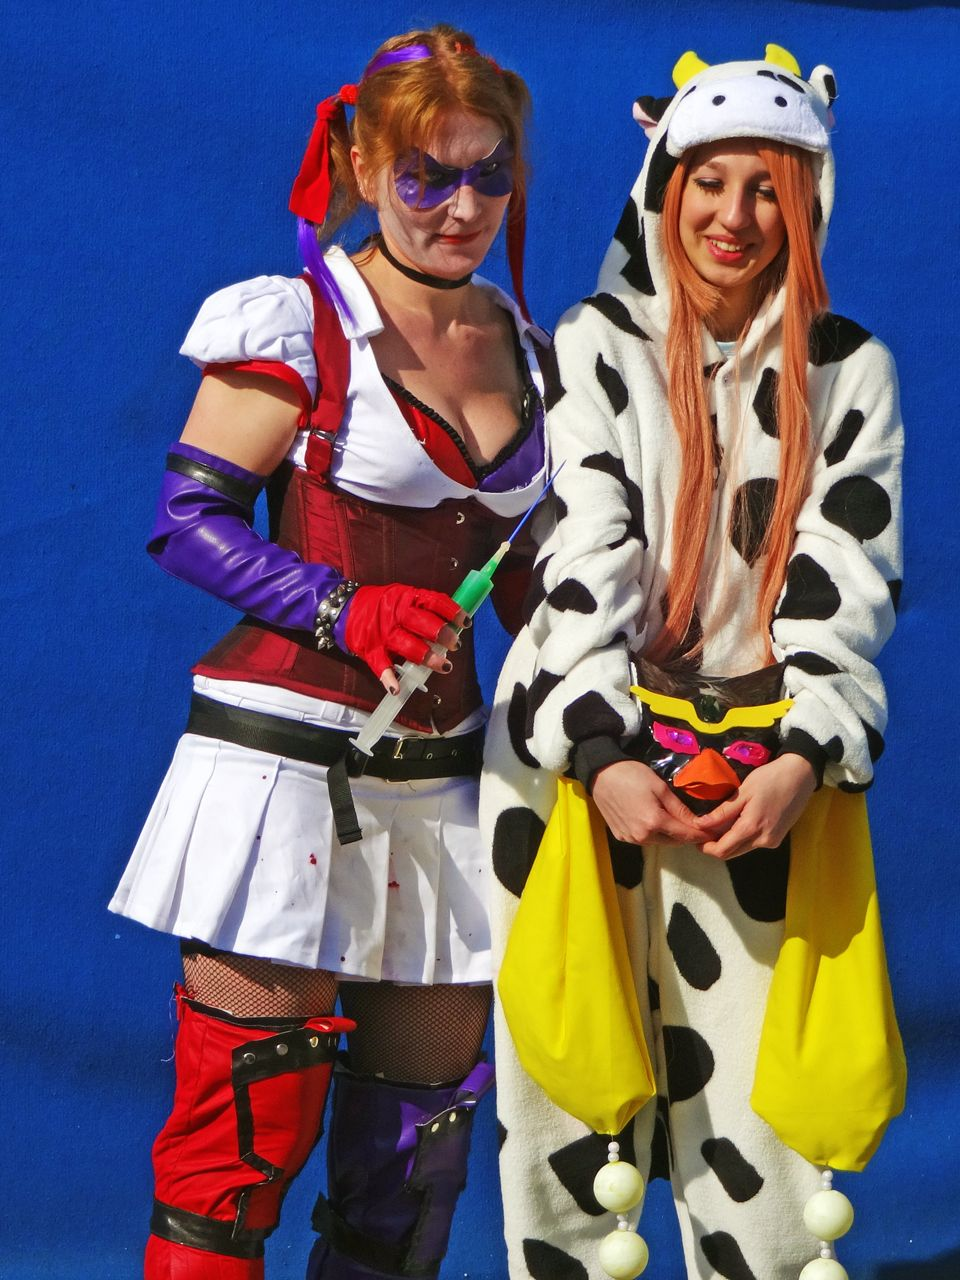 Harley Quinn #cosplay from Mantova #comics fair